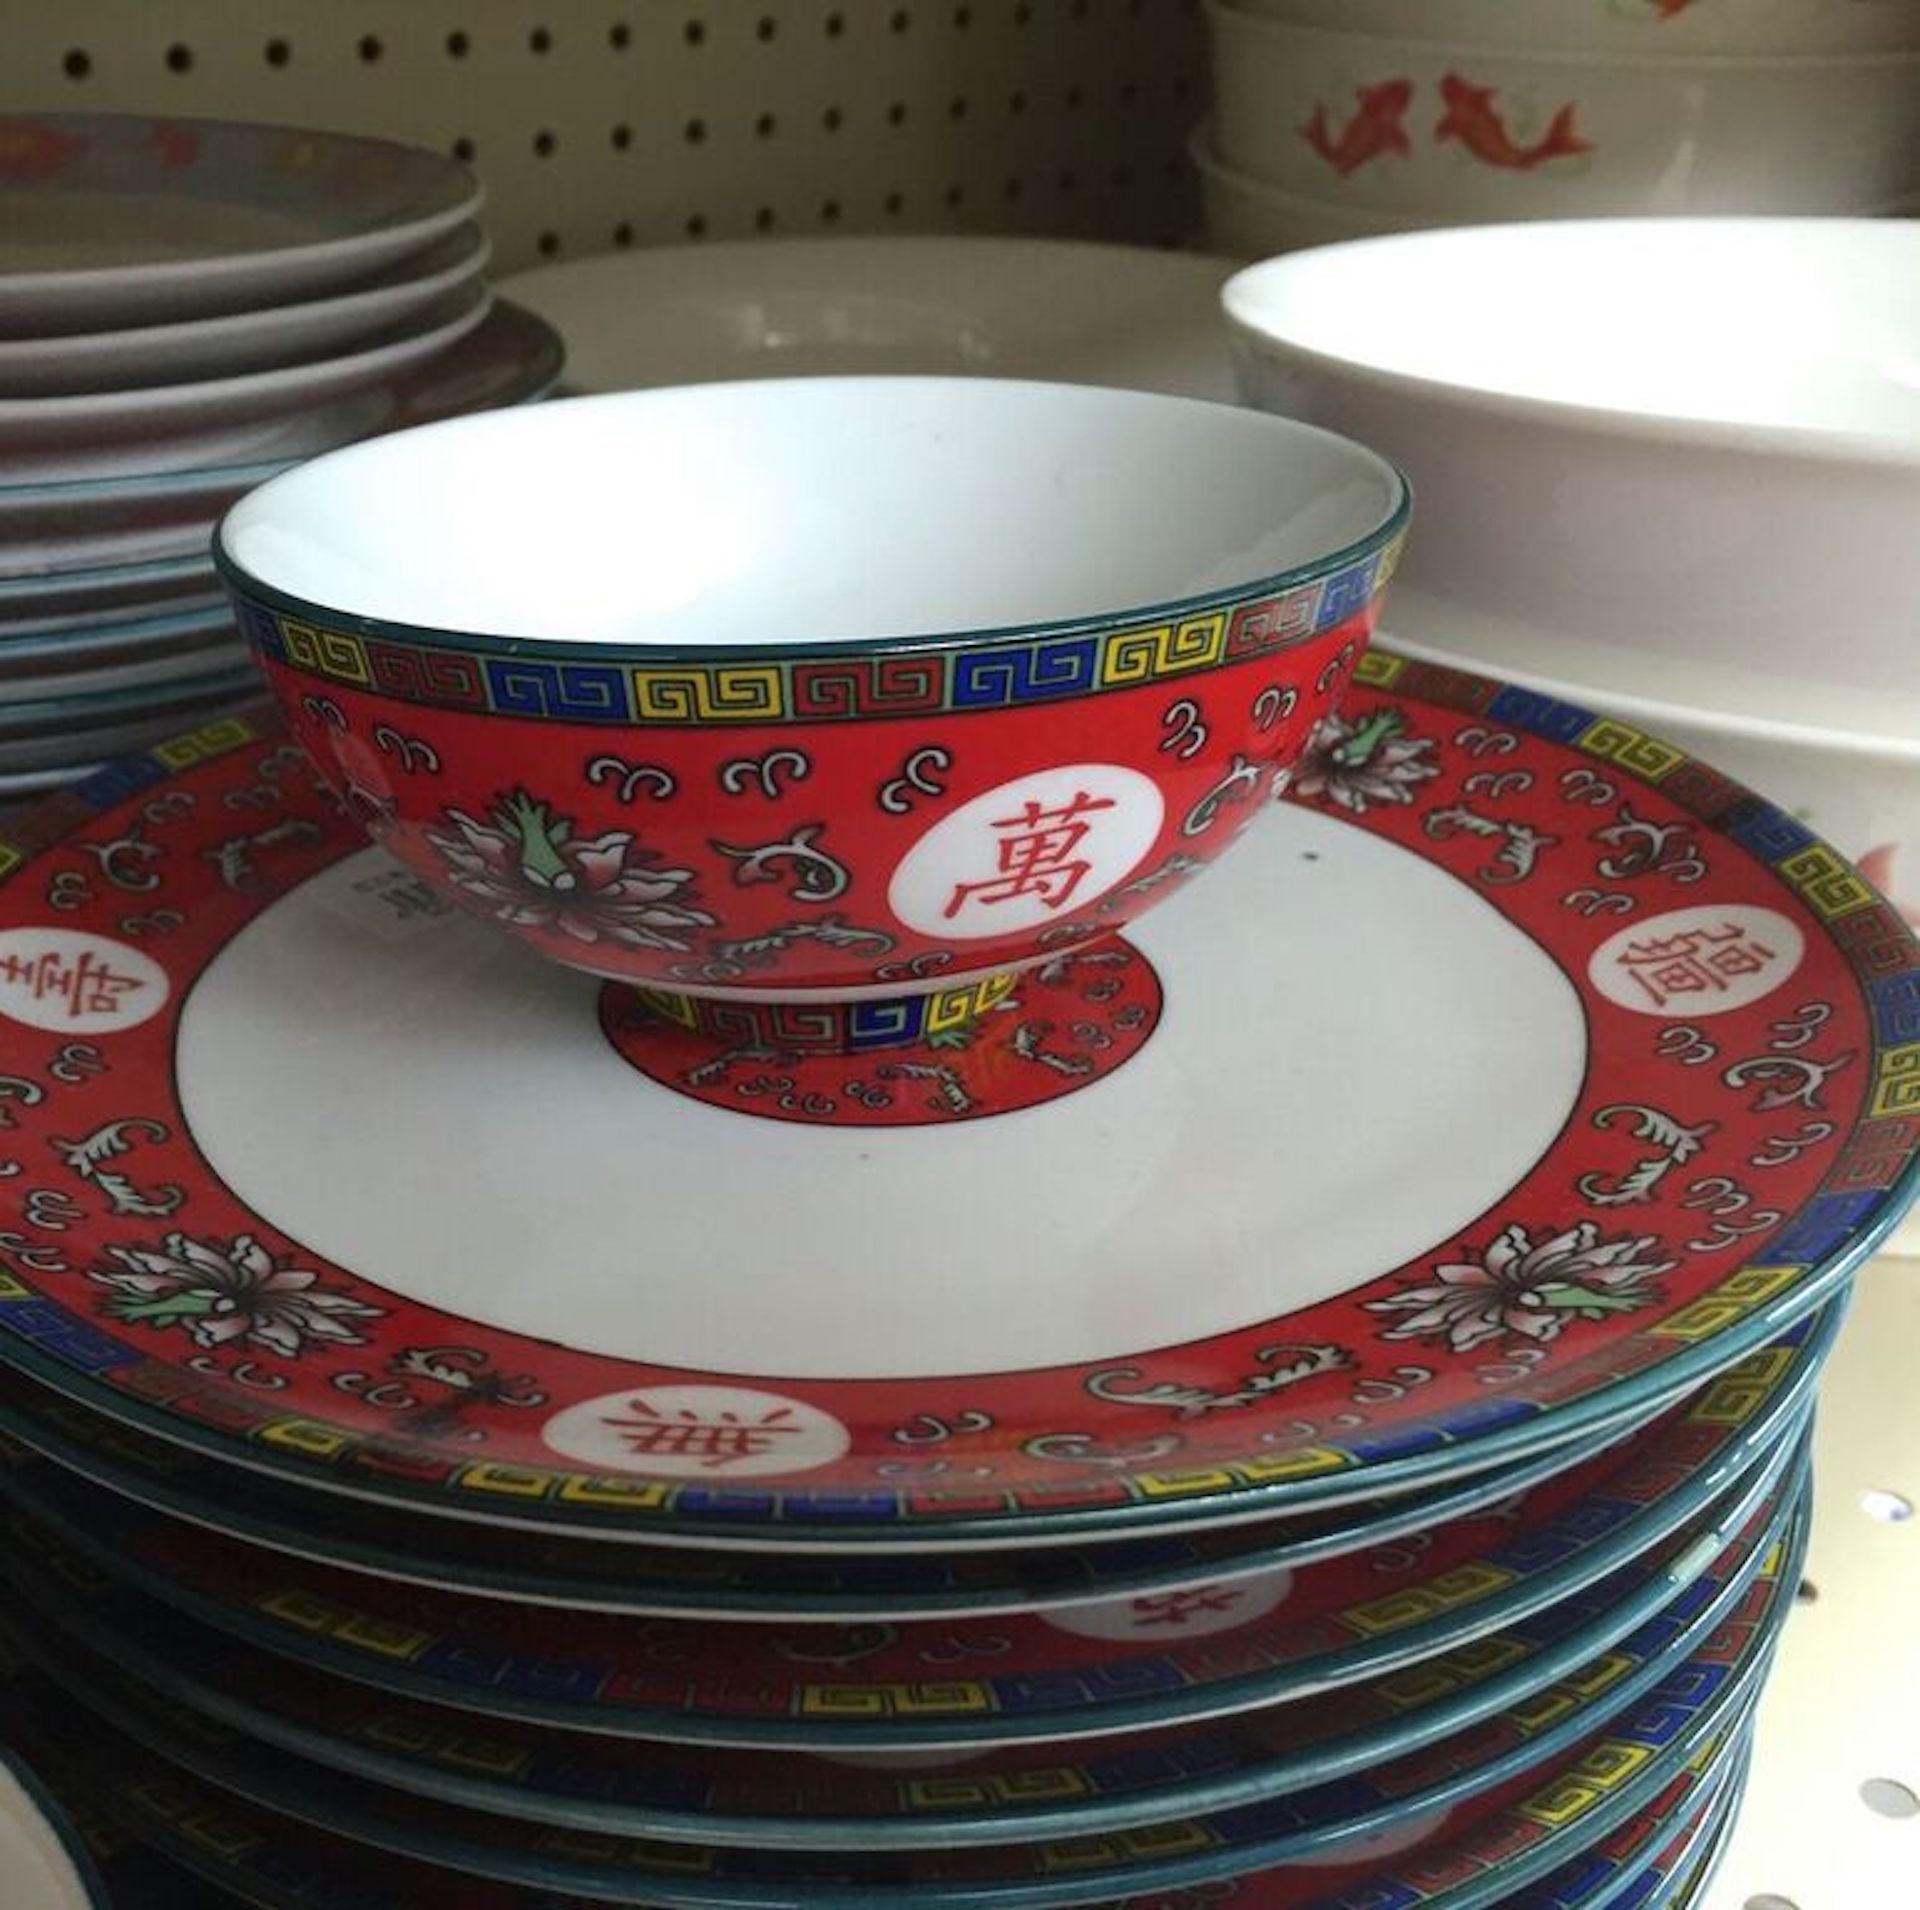 Auspicious red dishes